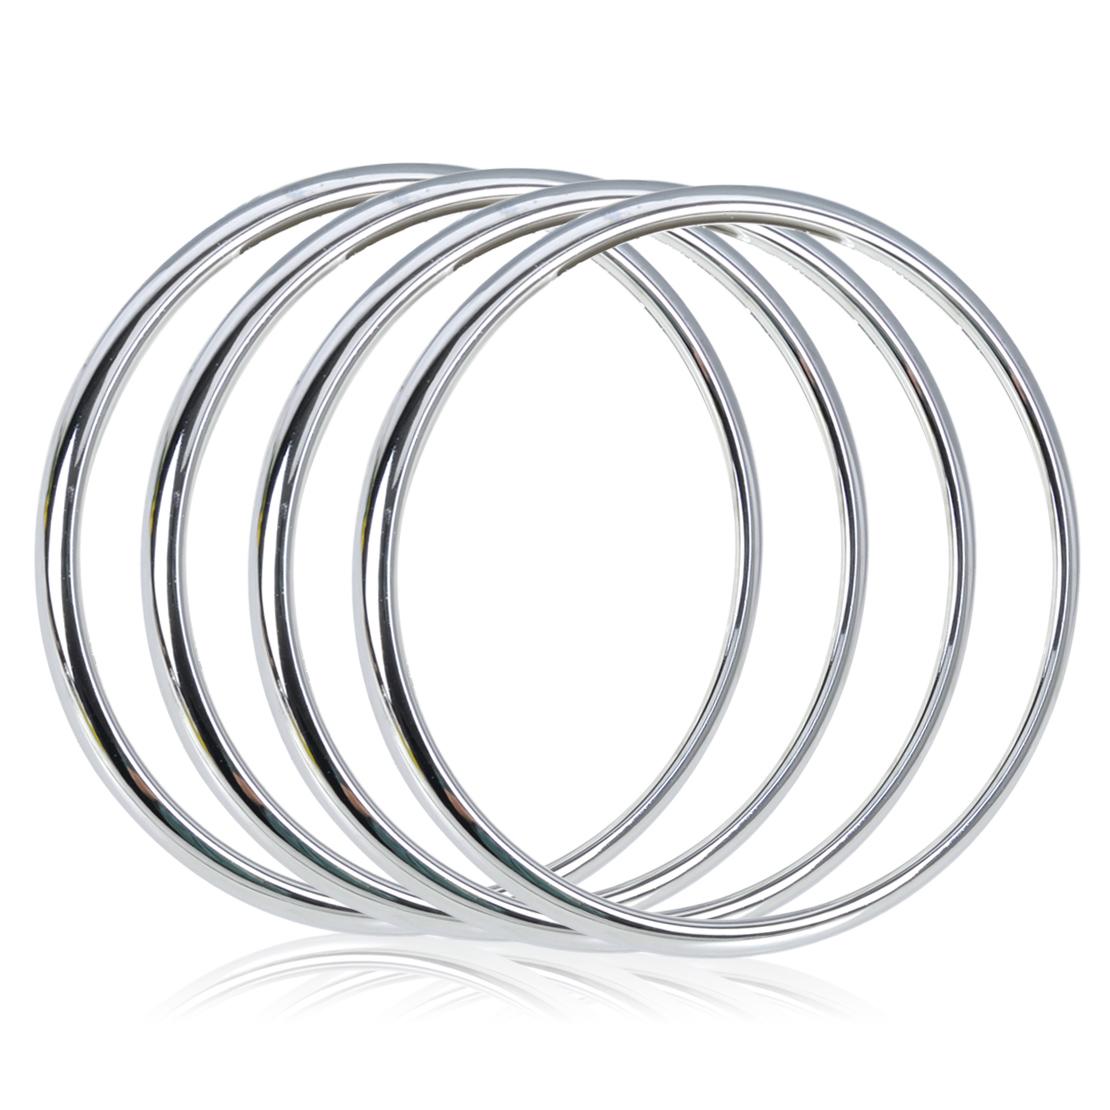 4X Audio Lautsprecher Blende Ring Chrom Rahmen Zierleisten